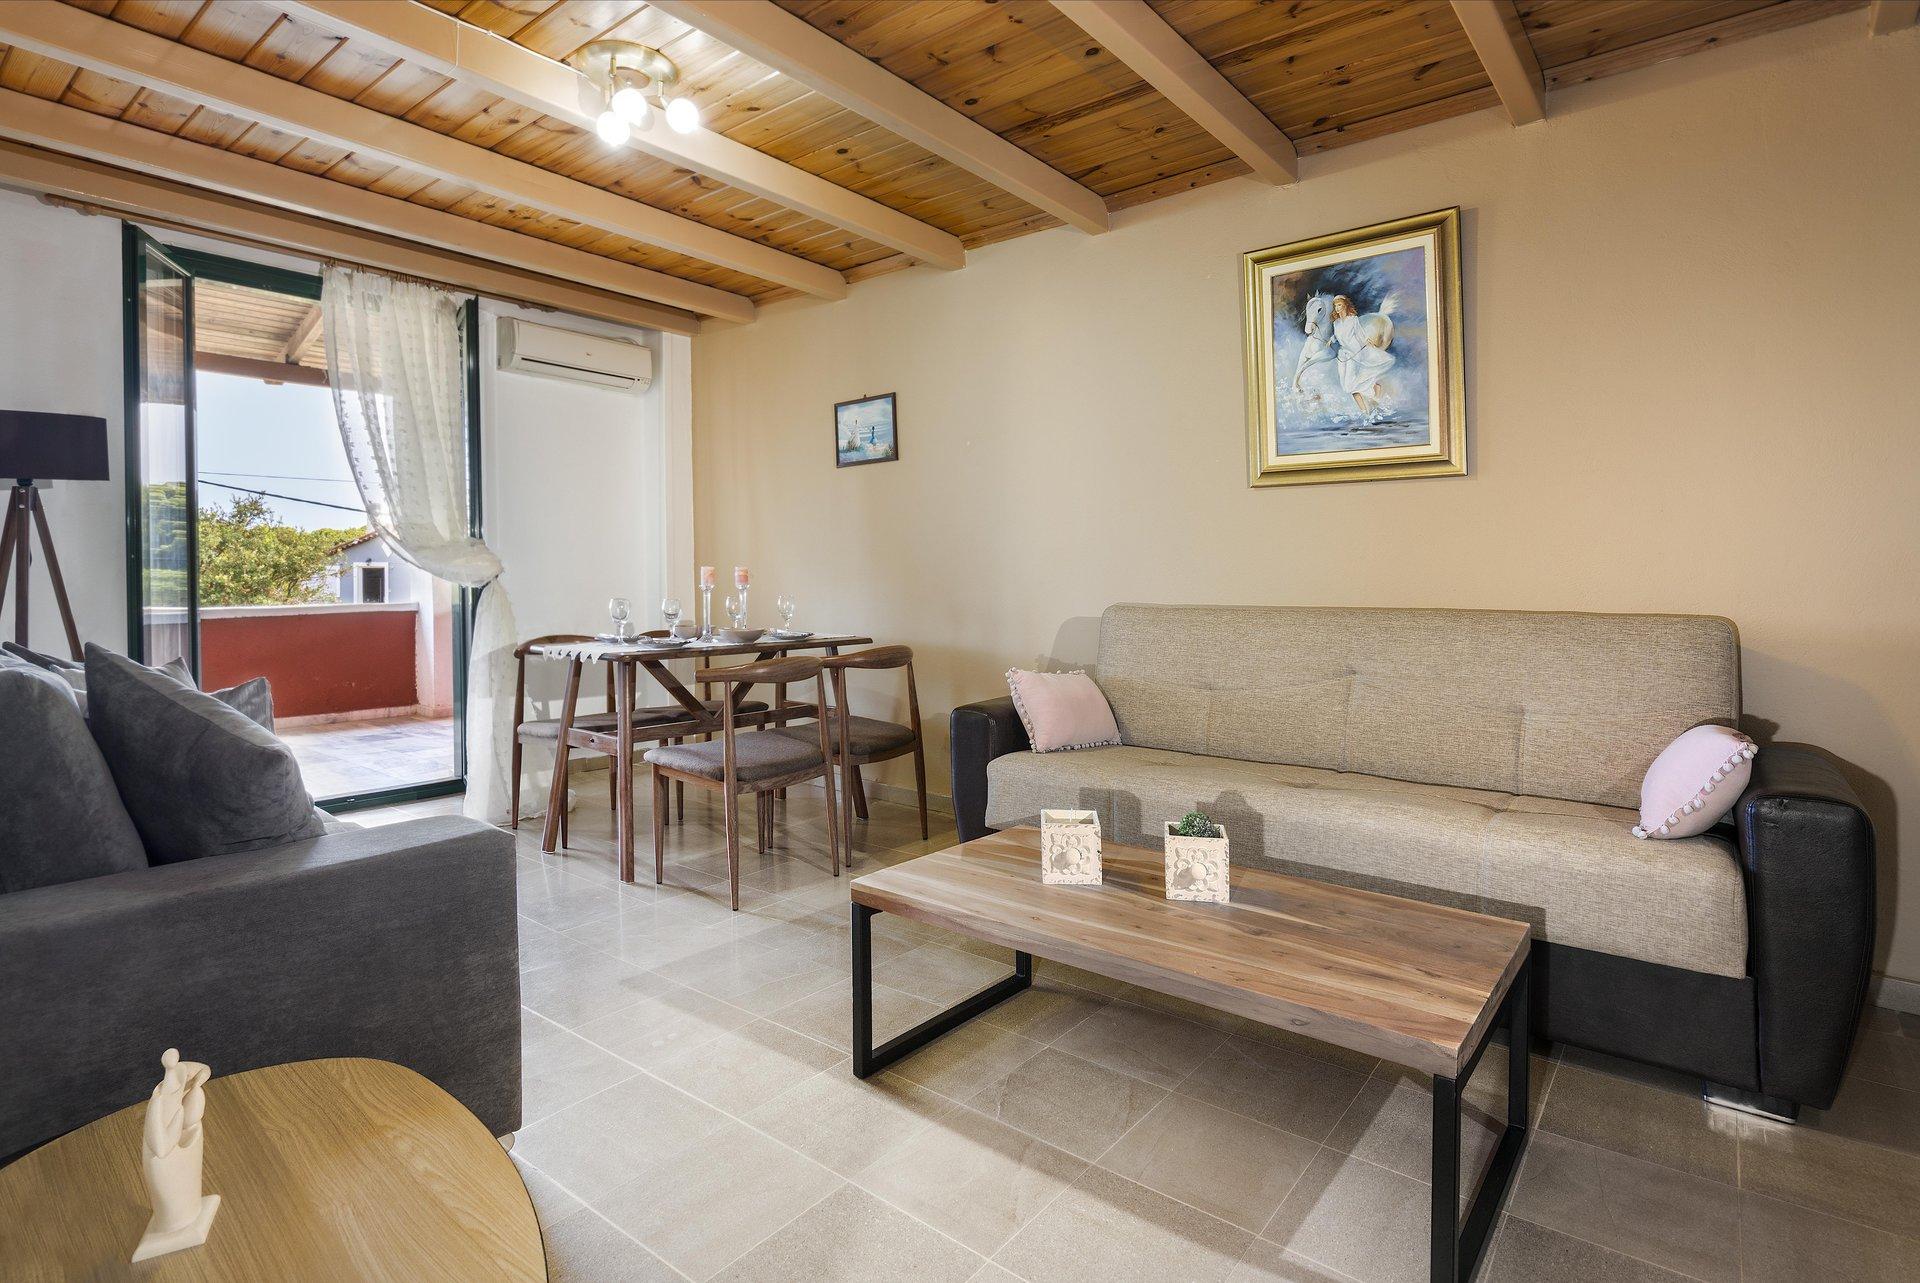 Vassilikos Garden - 3-kamer appartement